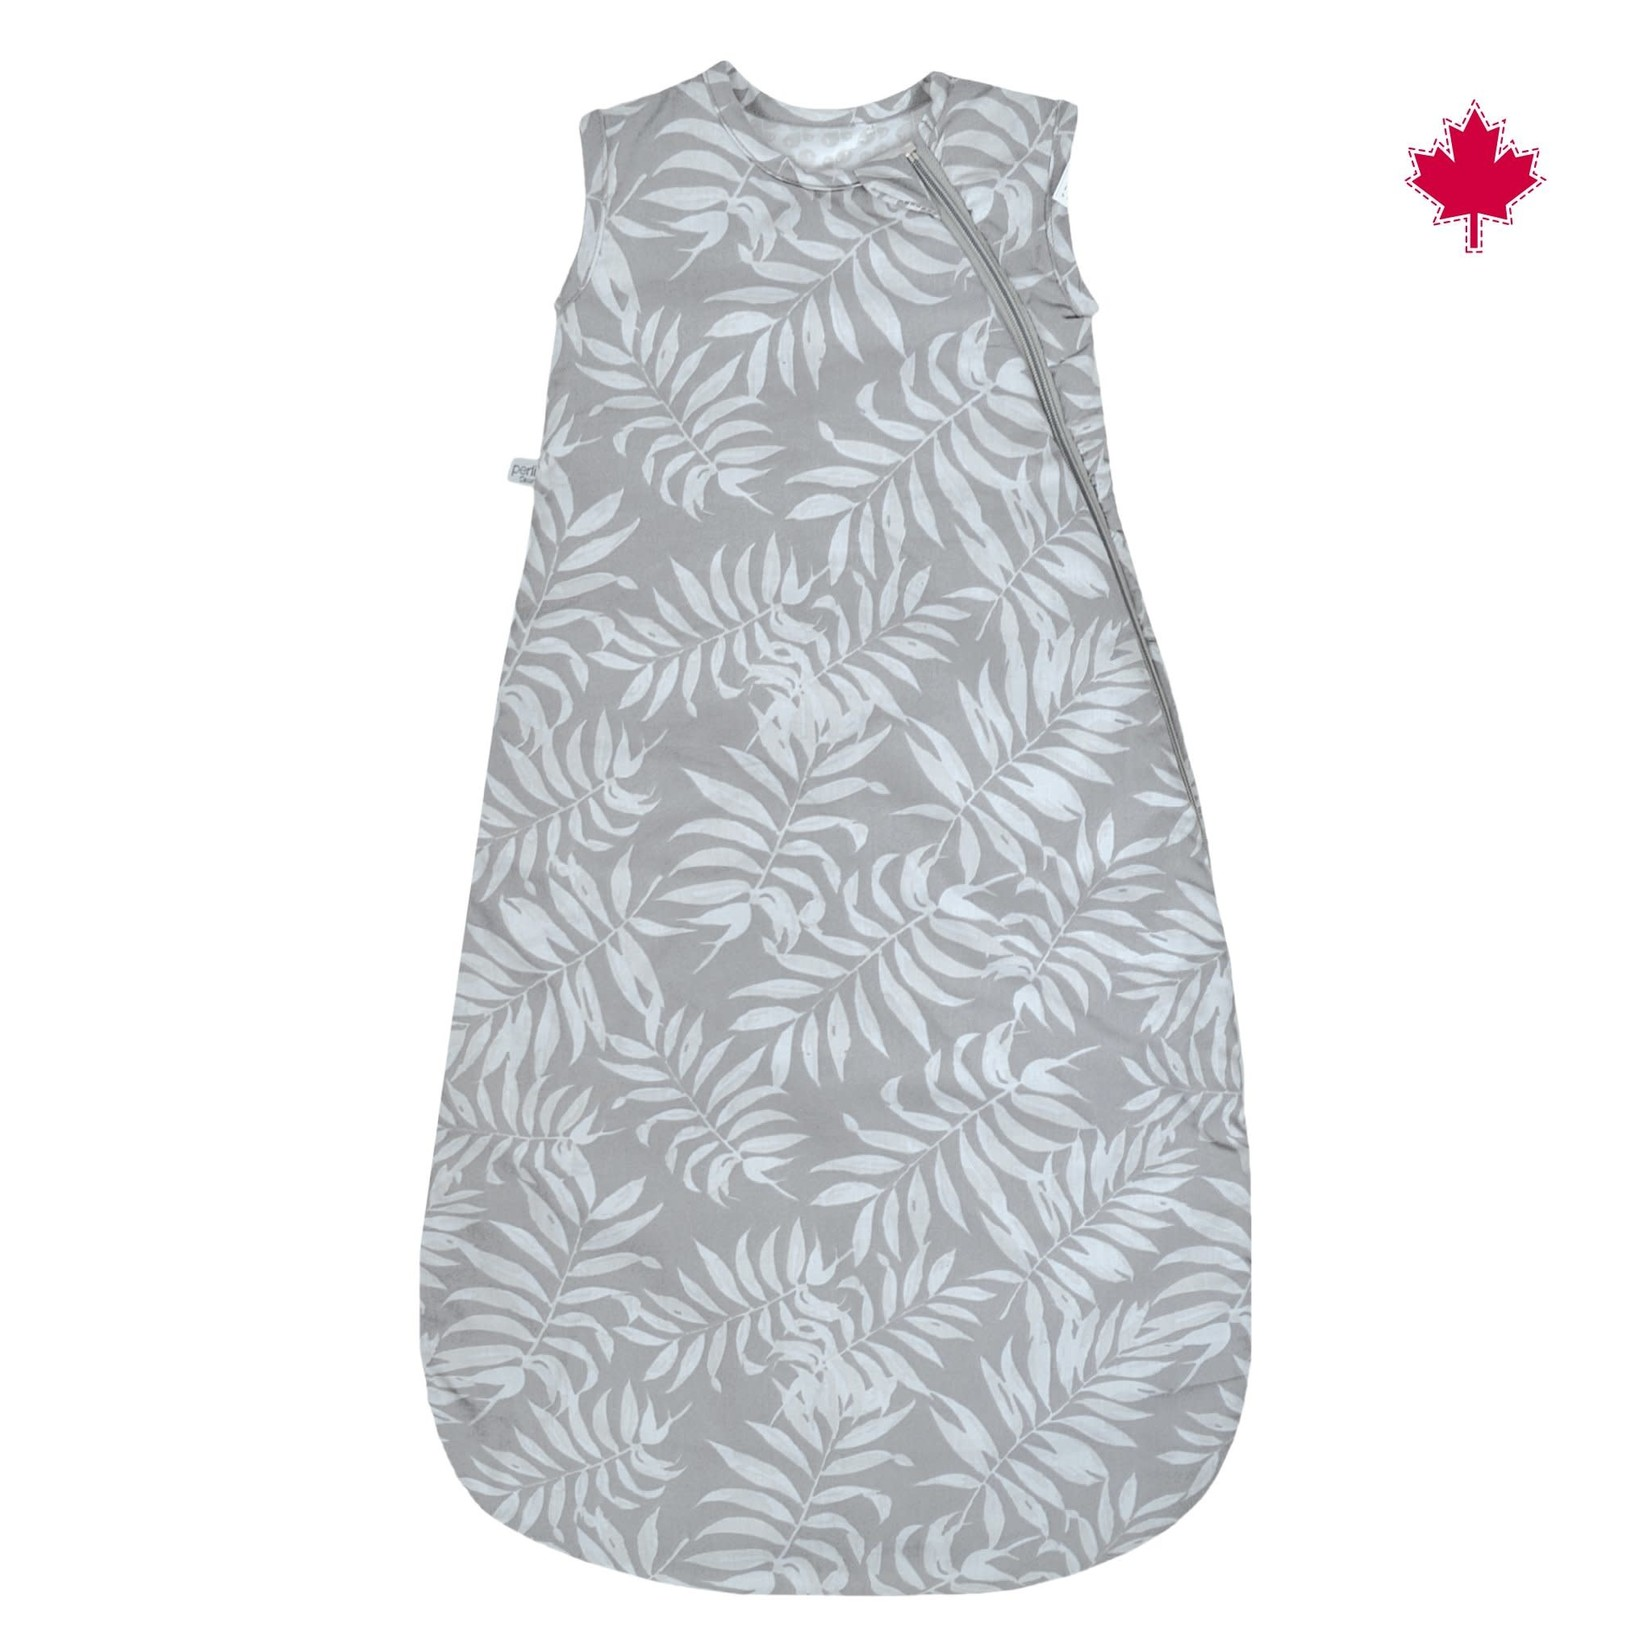 Woven Cotton Sleepbag - Tropical Grey